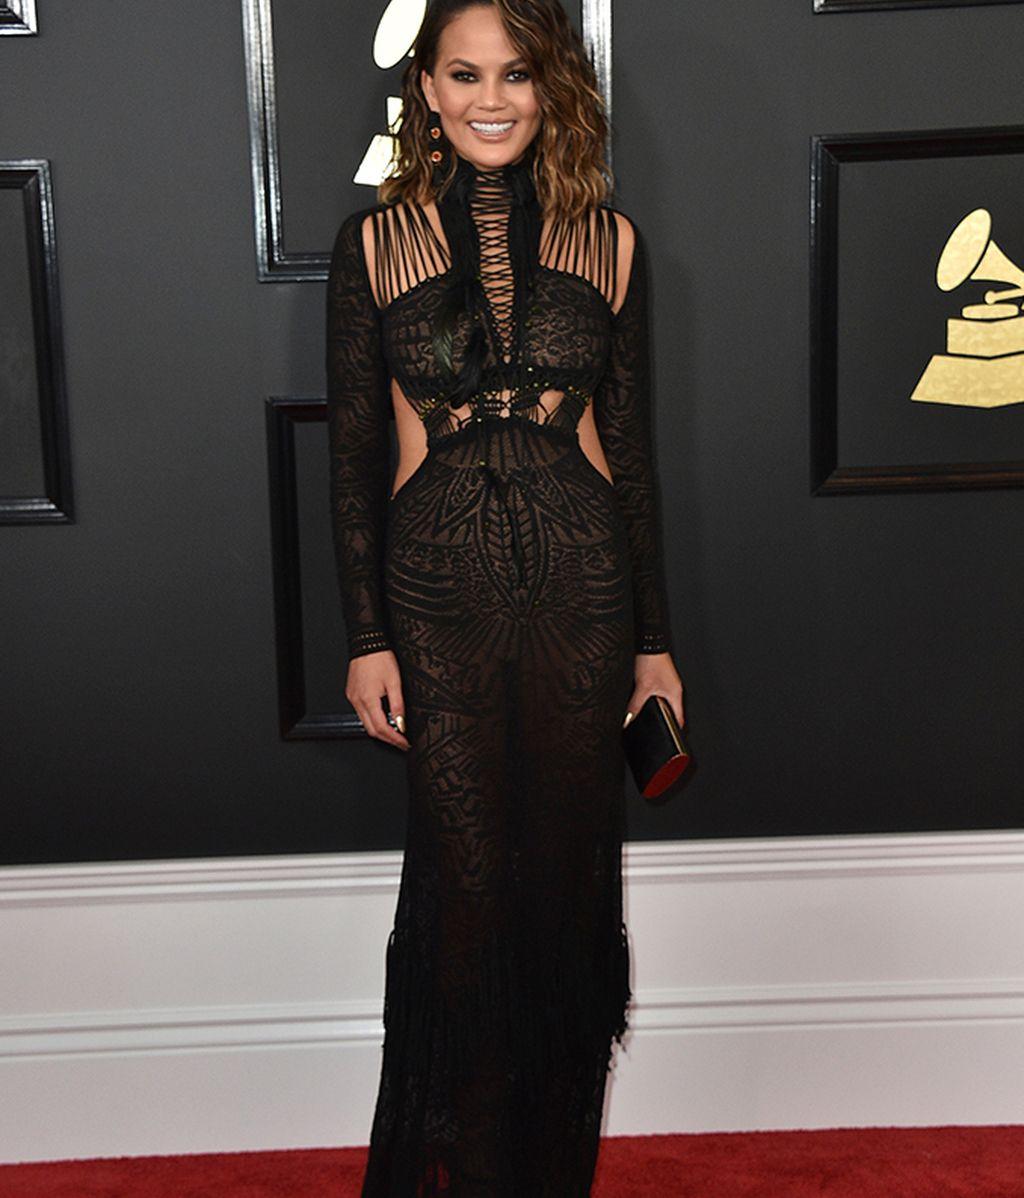 Chrissy Teigen con vestido negro semitransparente